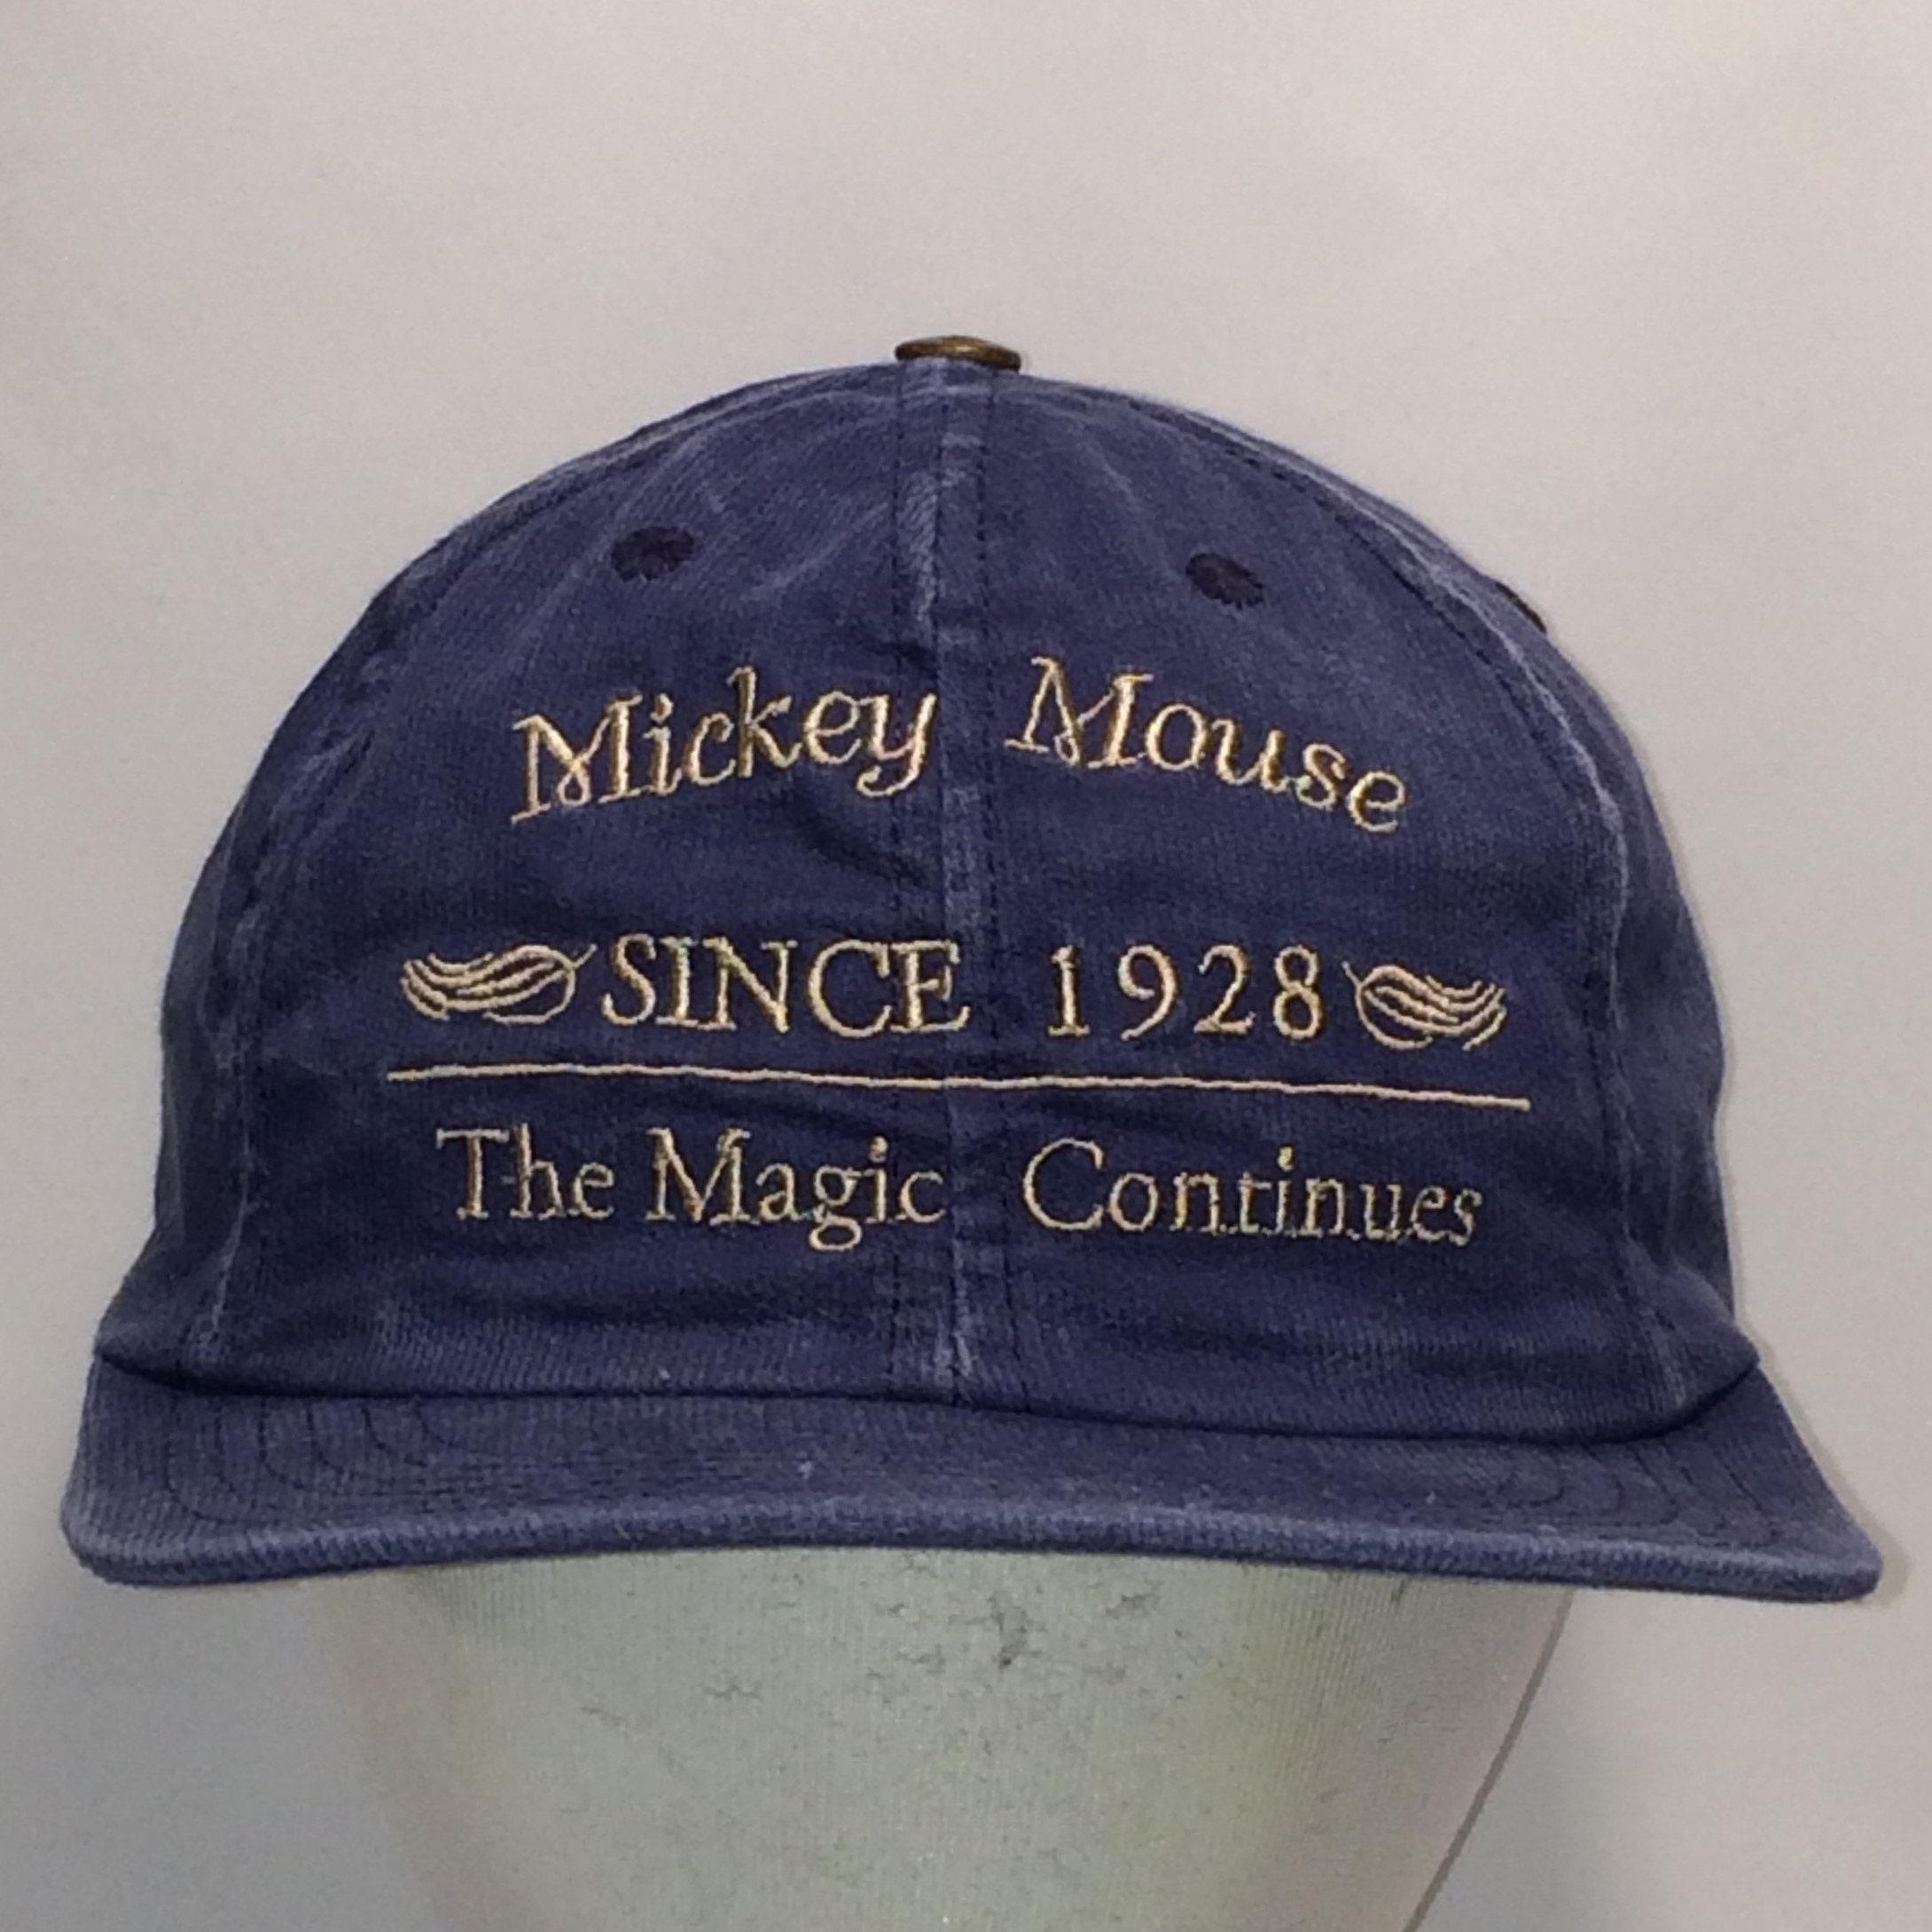 b3cb5bc74363d Vintage Hats Mickey Mouse Strapback Hat Caps Blue Baseball Cap